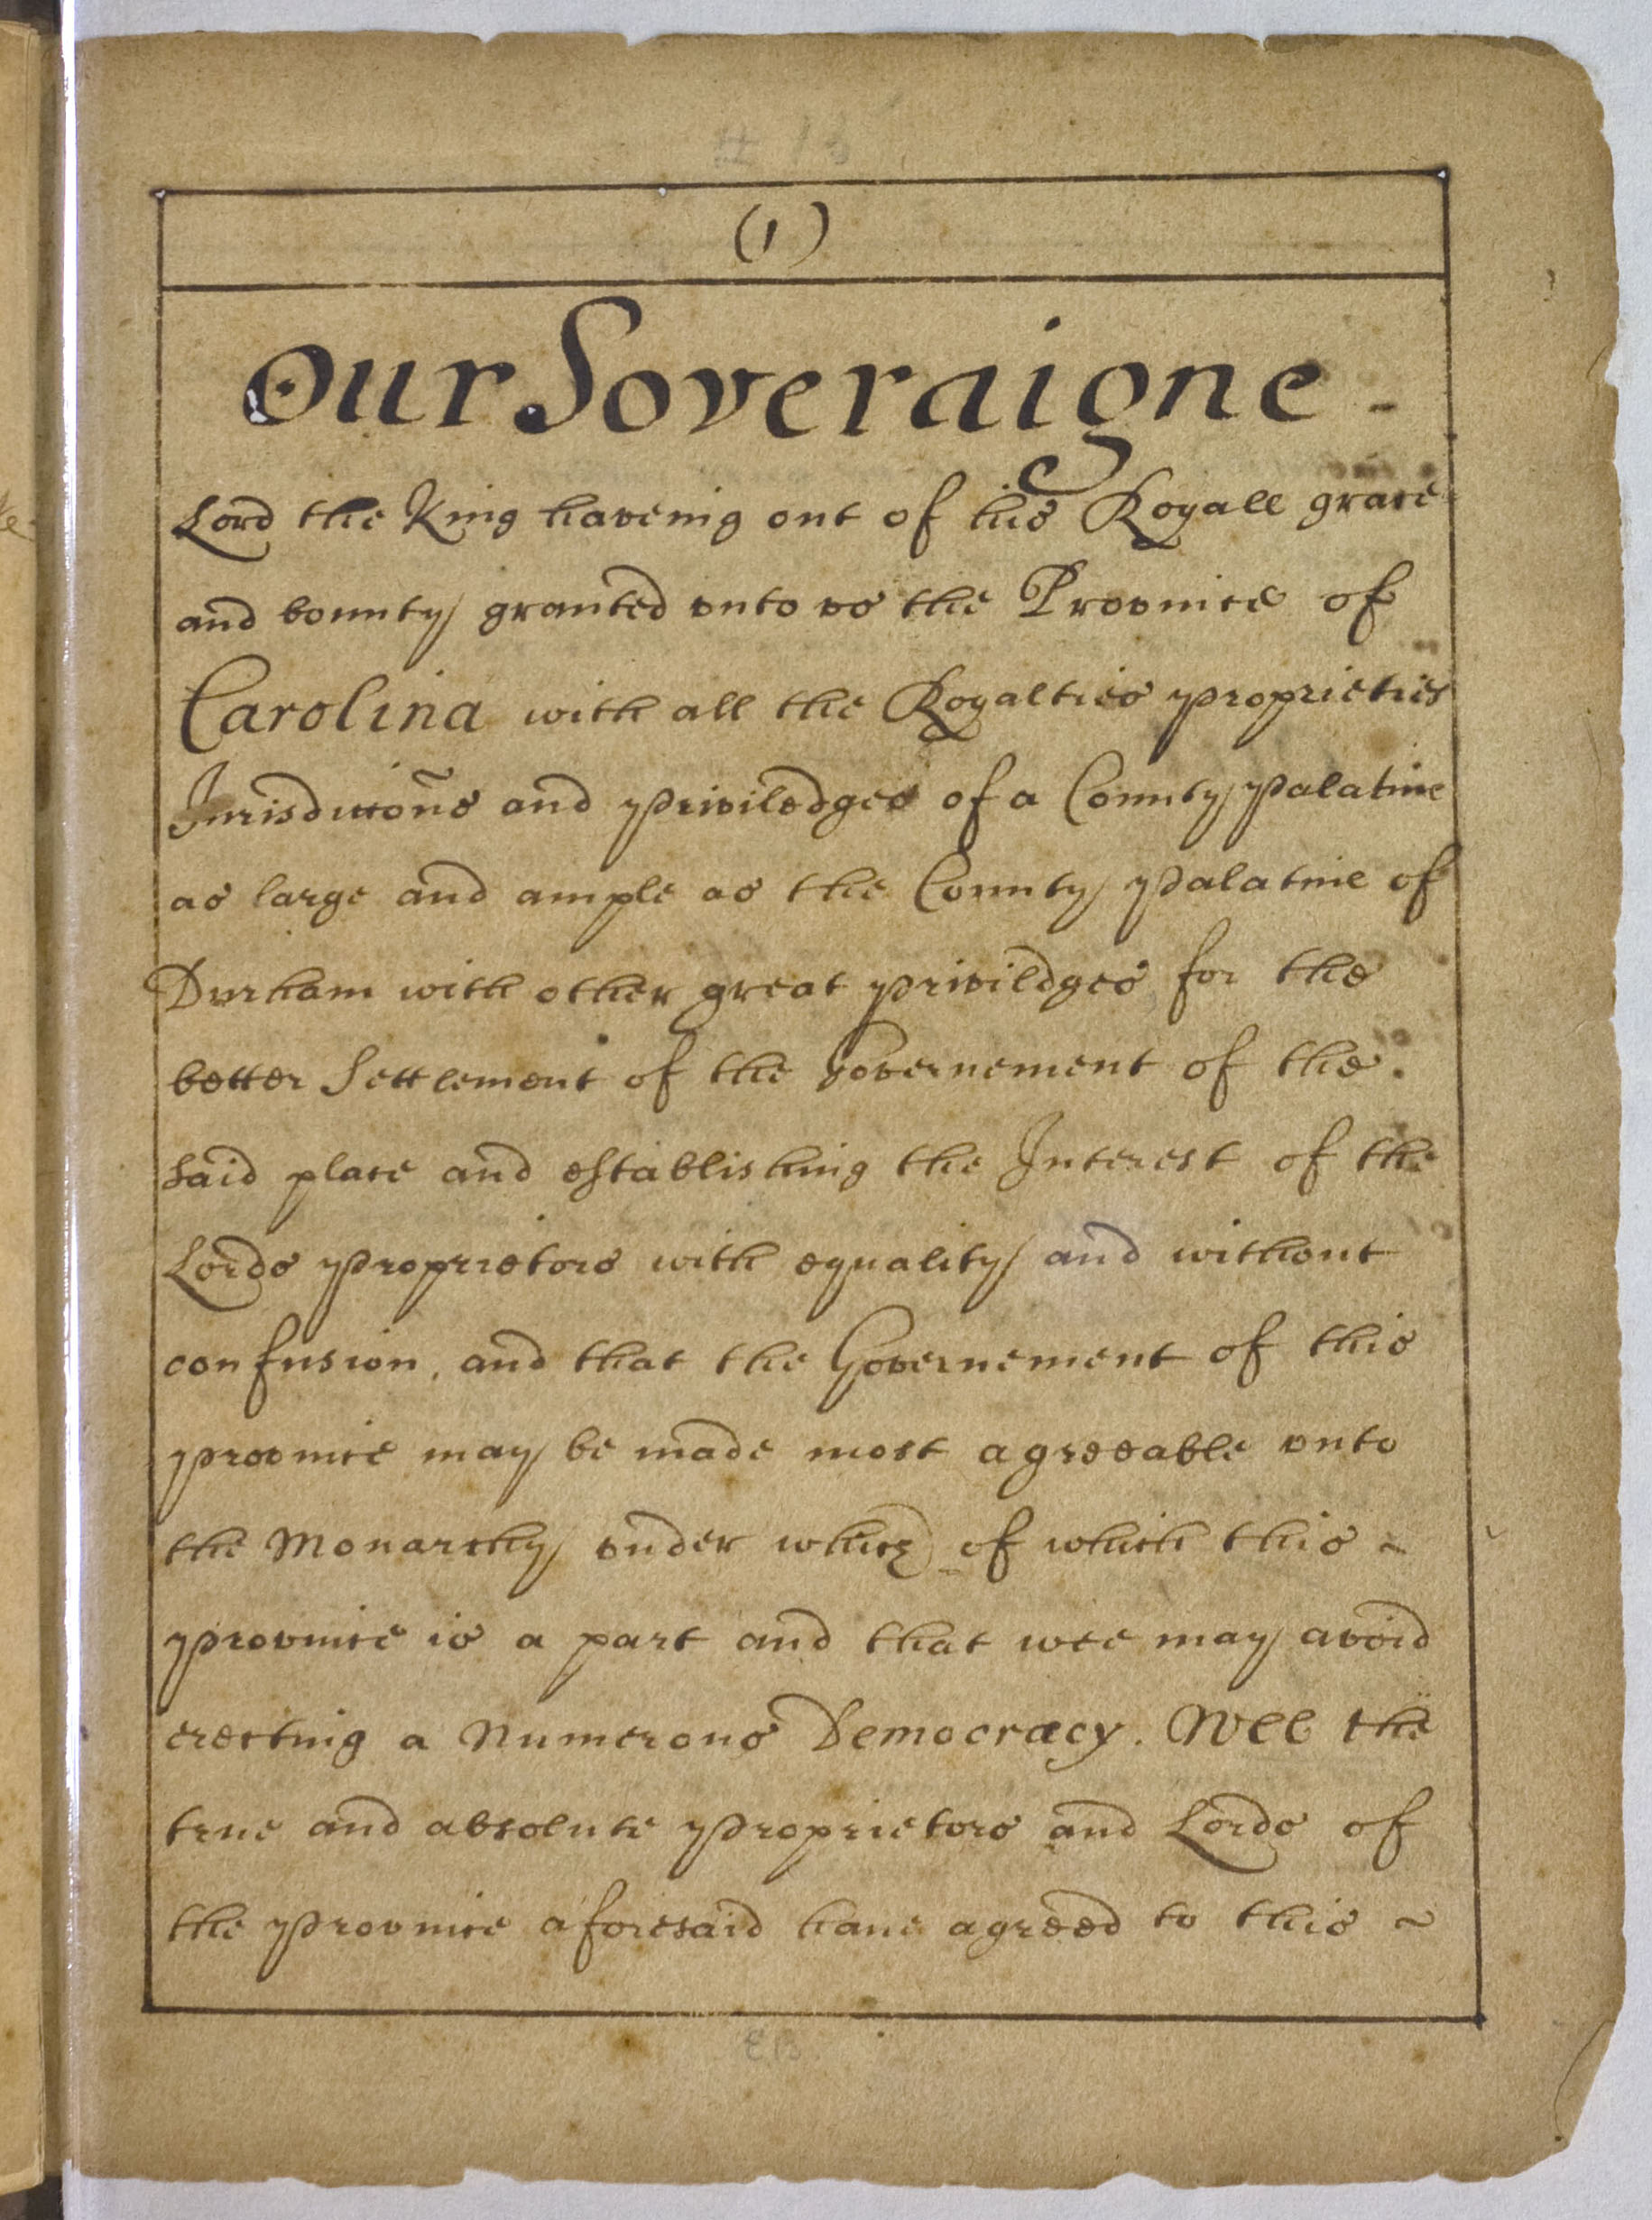 Fundamental Constitutions of Carolina